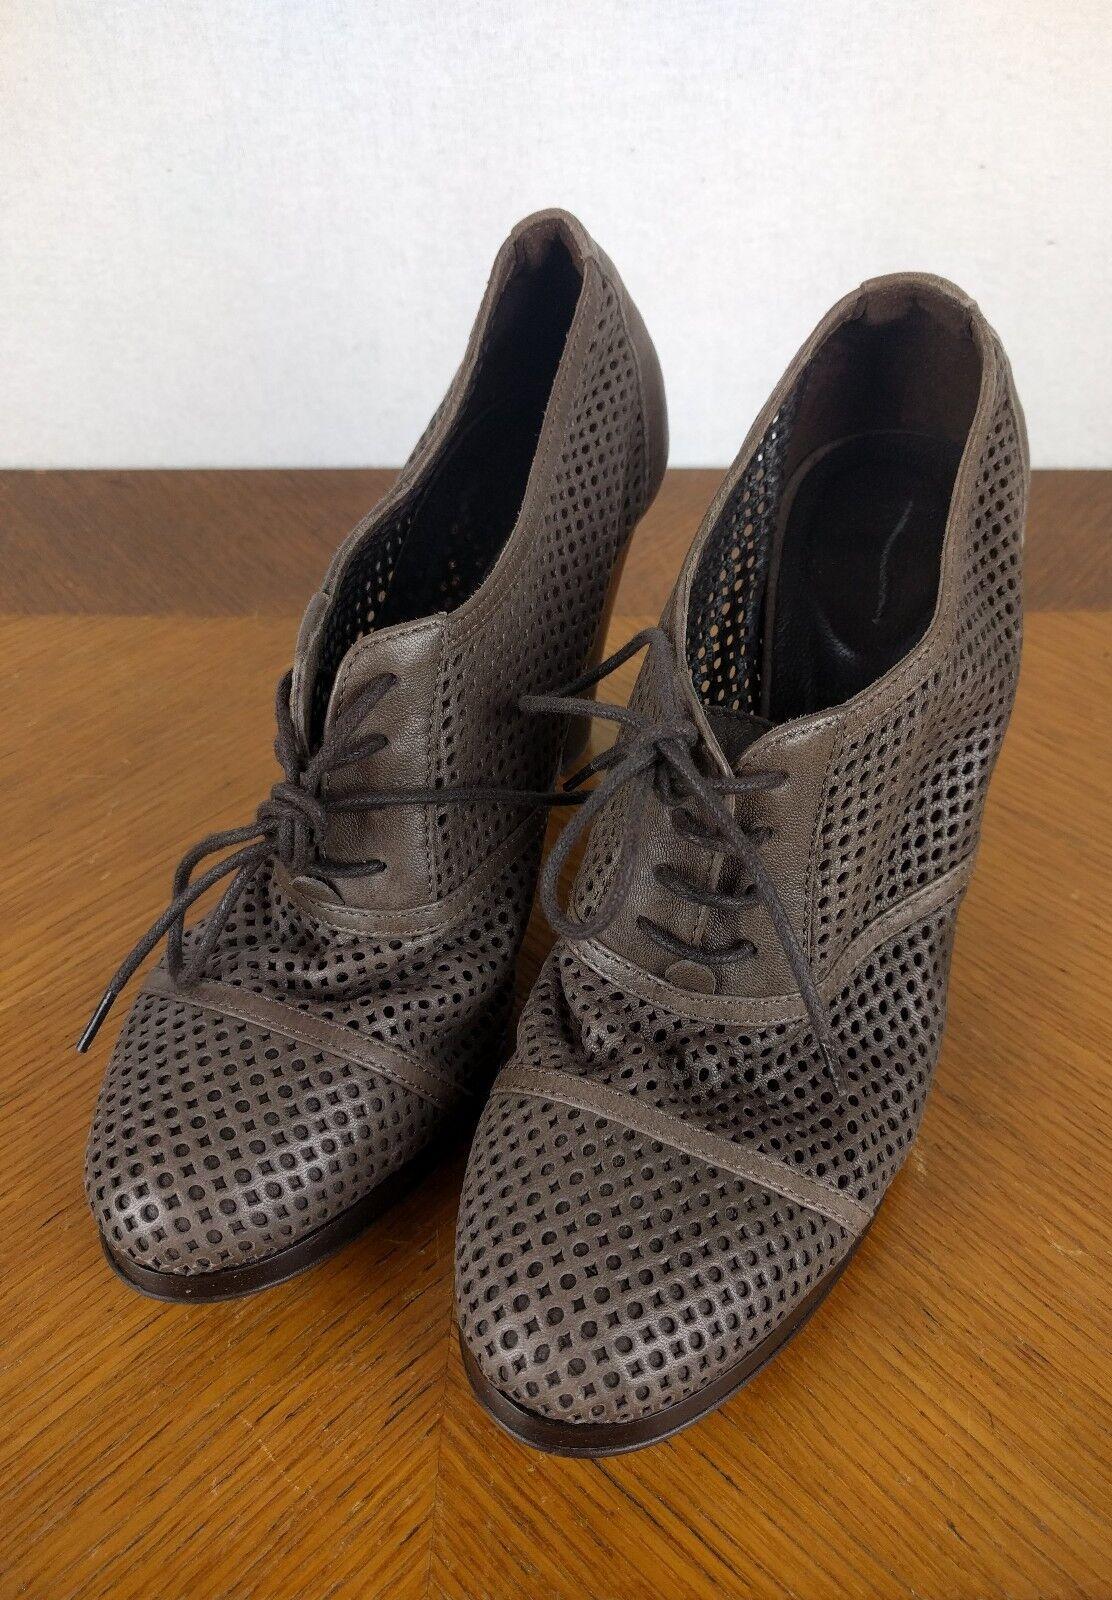 J CREW Brown Lace Up Heels Womens Sz 6.5 Designer Pumps Boots Leather  shoes